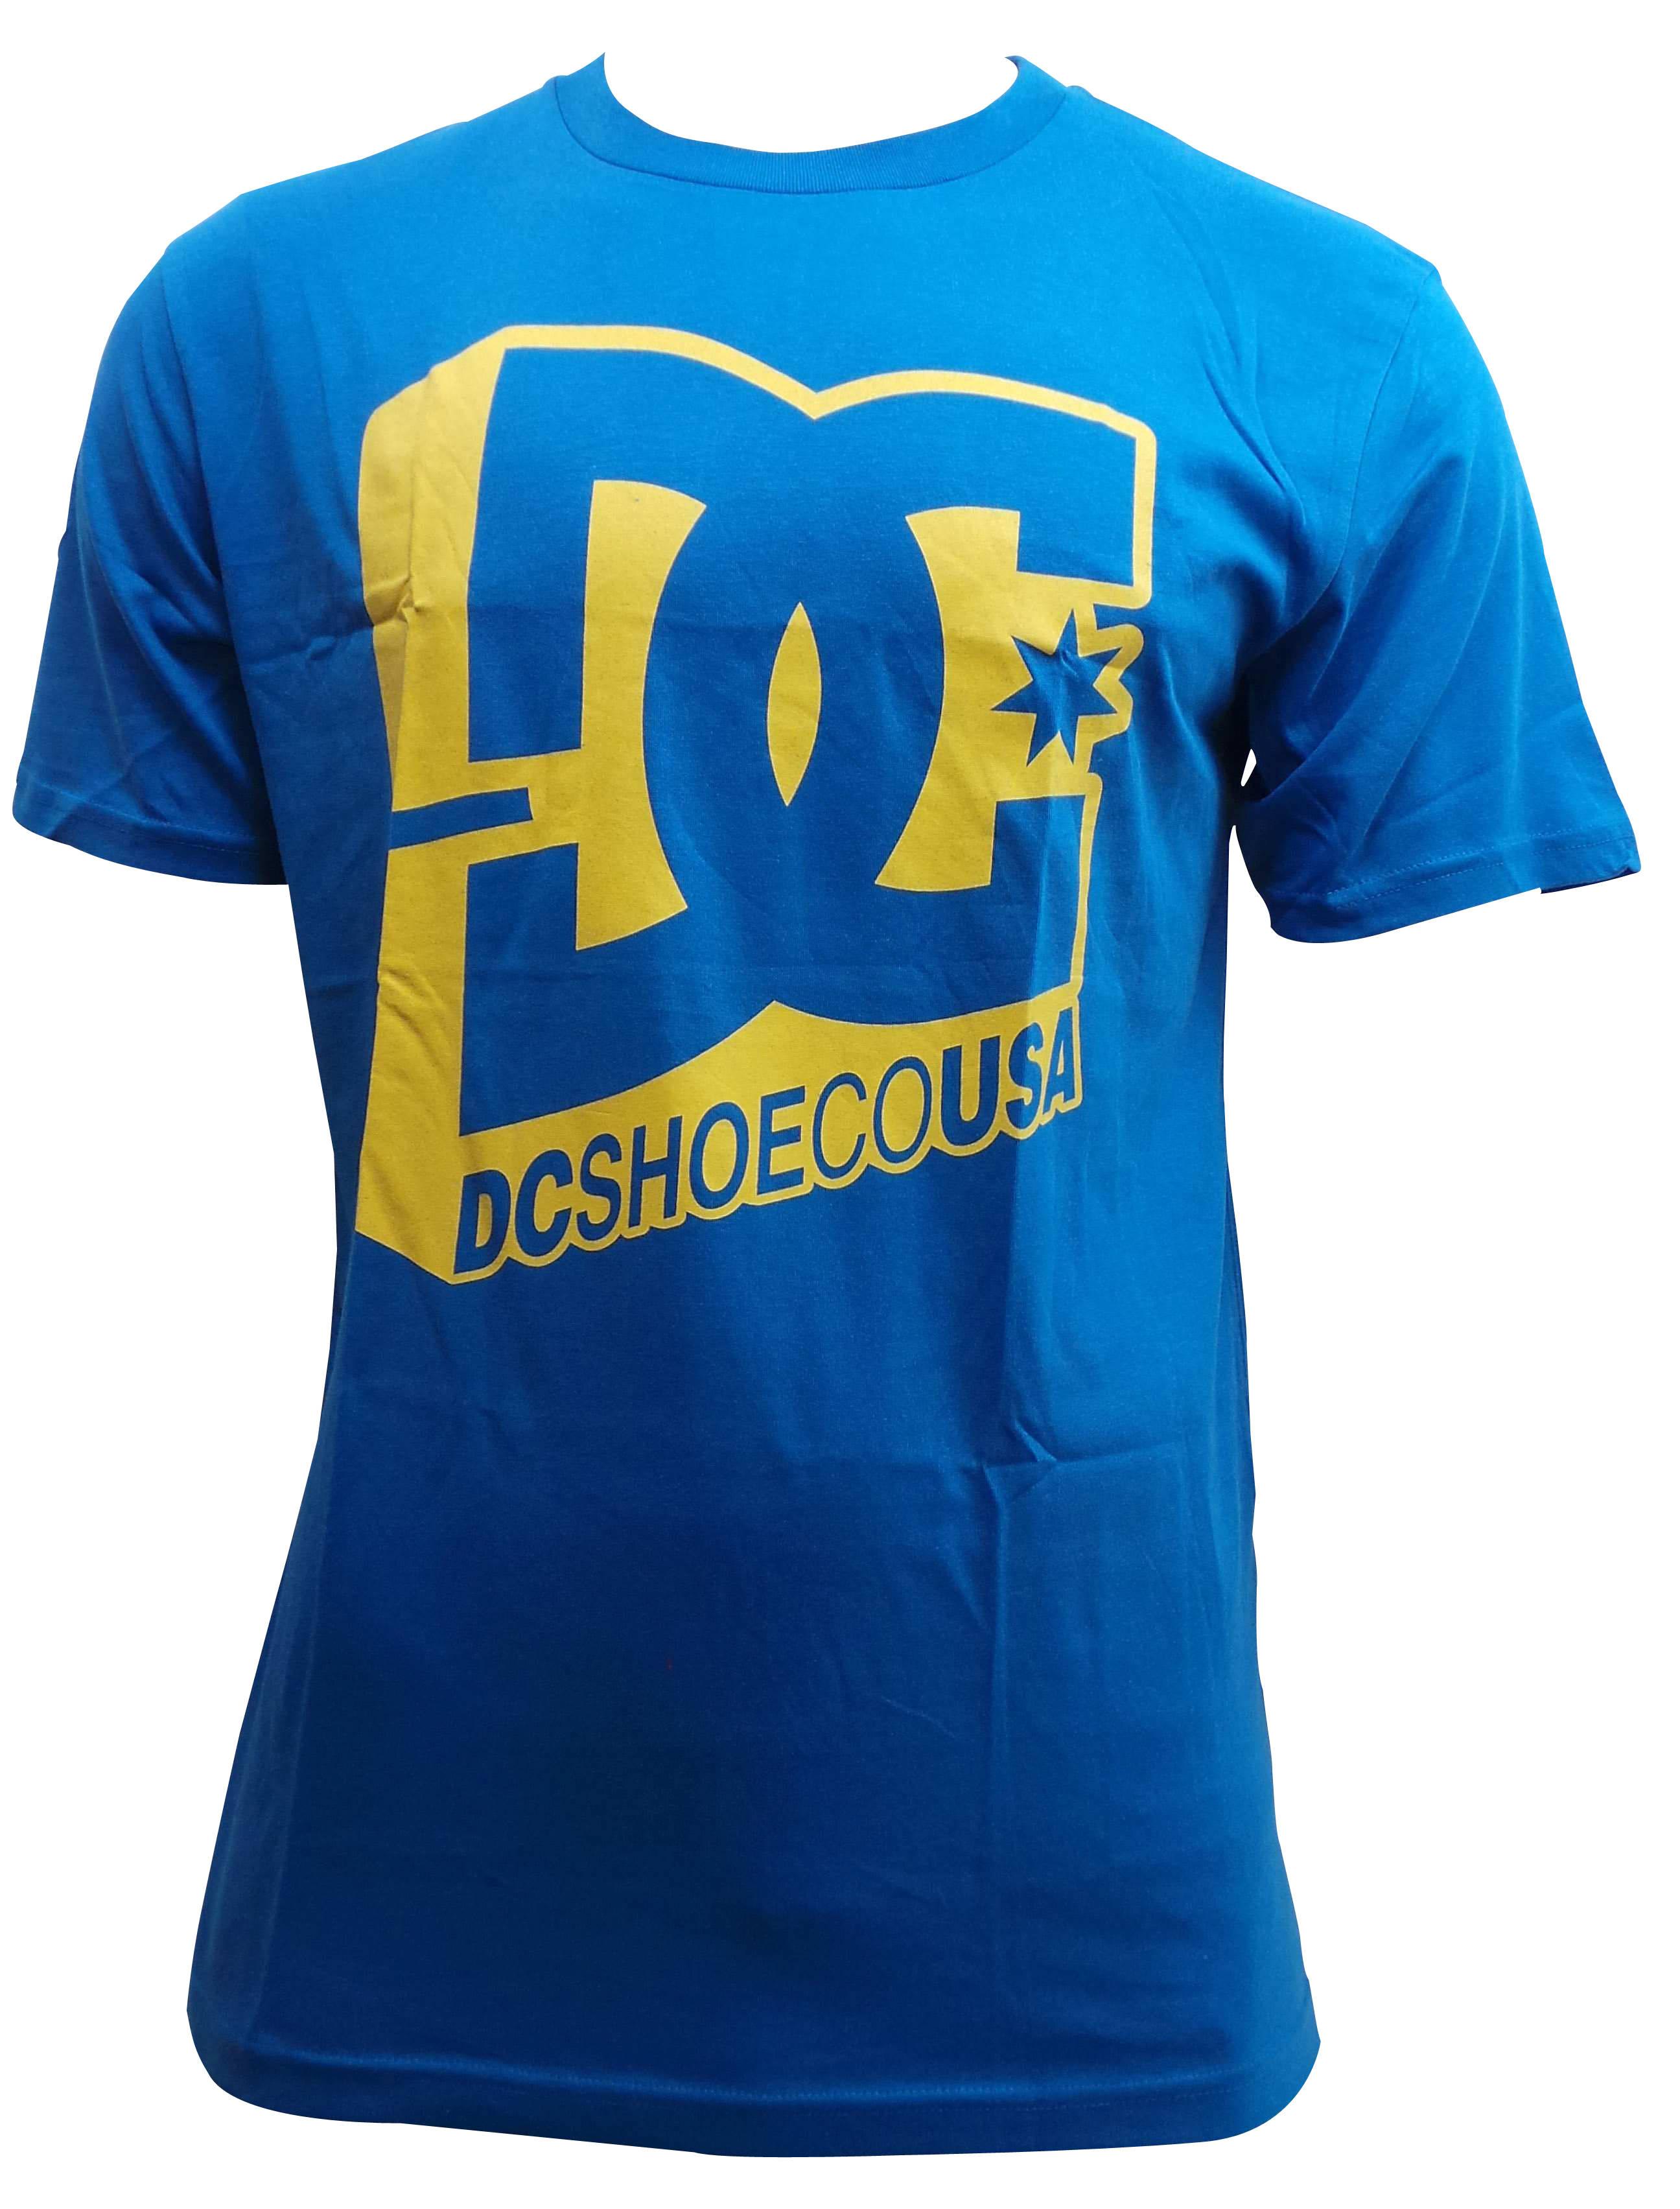 Joblot of 10 mens dc skate t shirts assorted designs sizes for Dc t shirt design